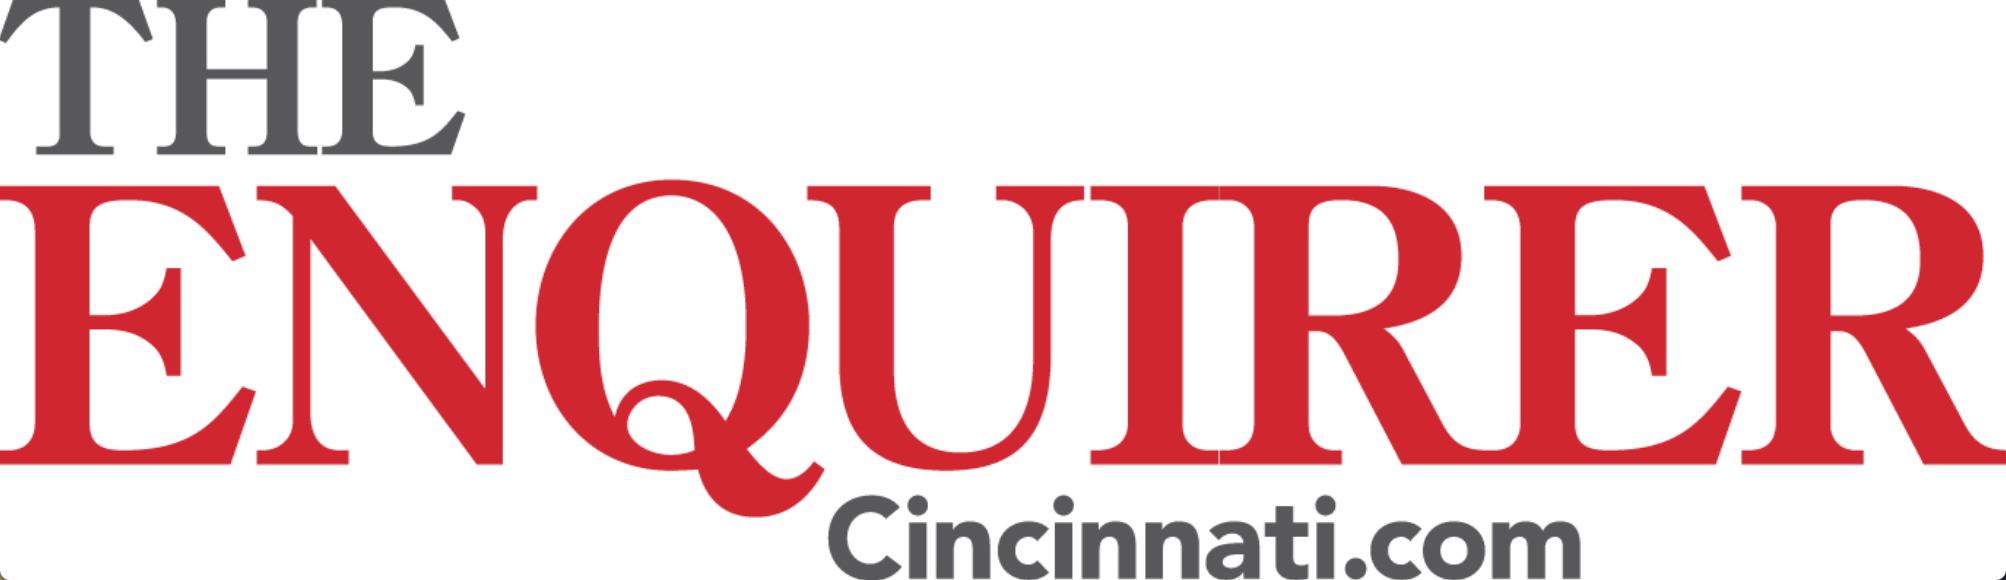 Cincinnati Enquirer.png